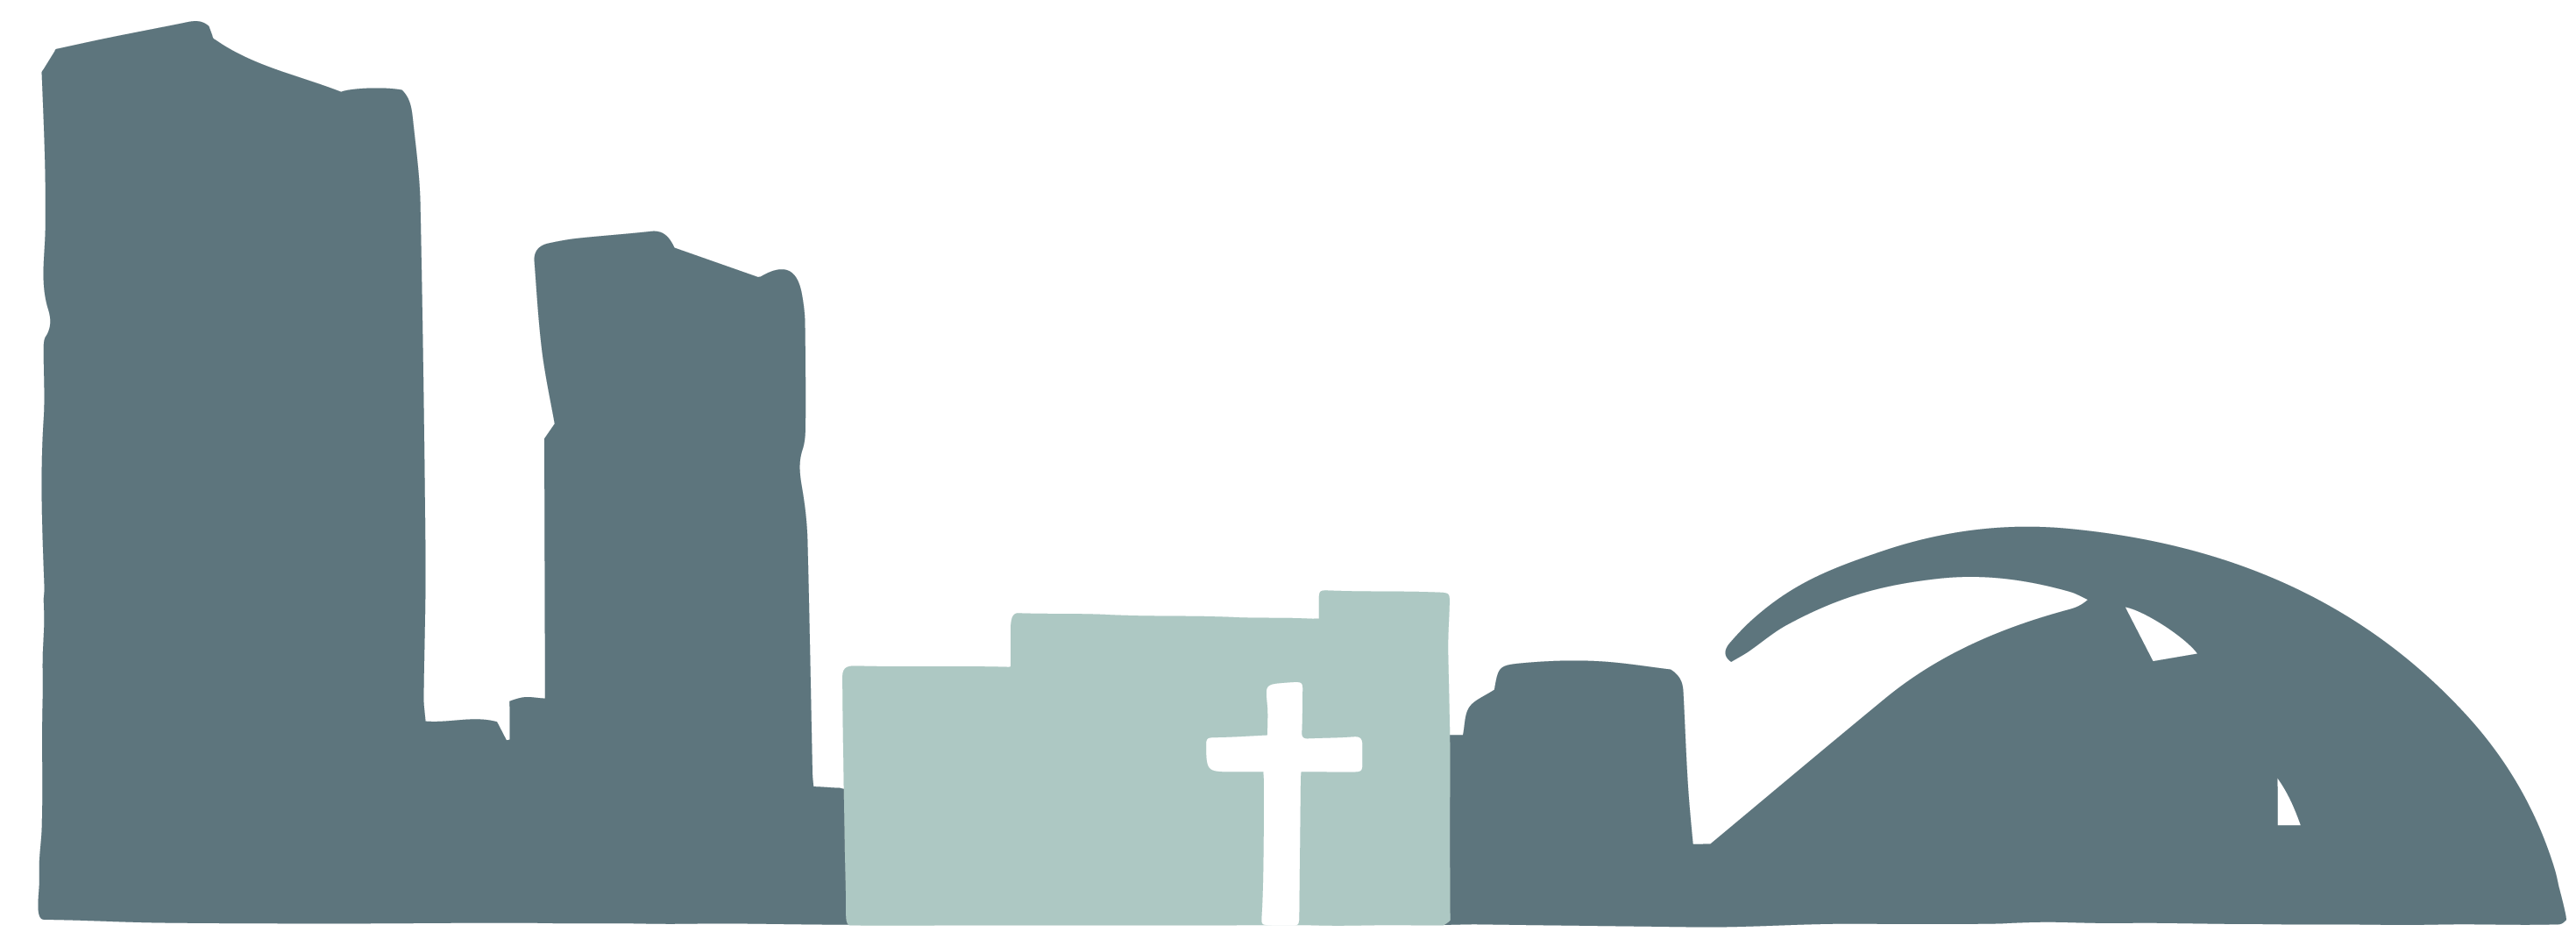 iglesia evangelica tenerife